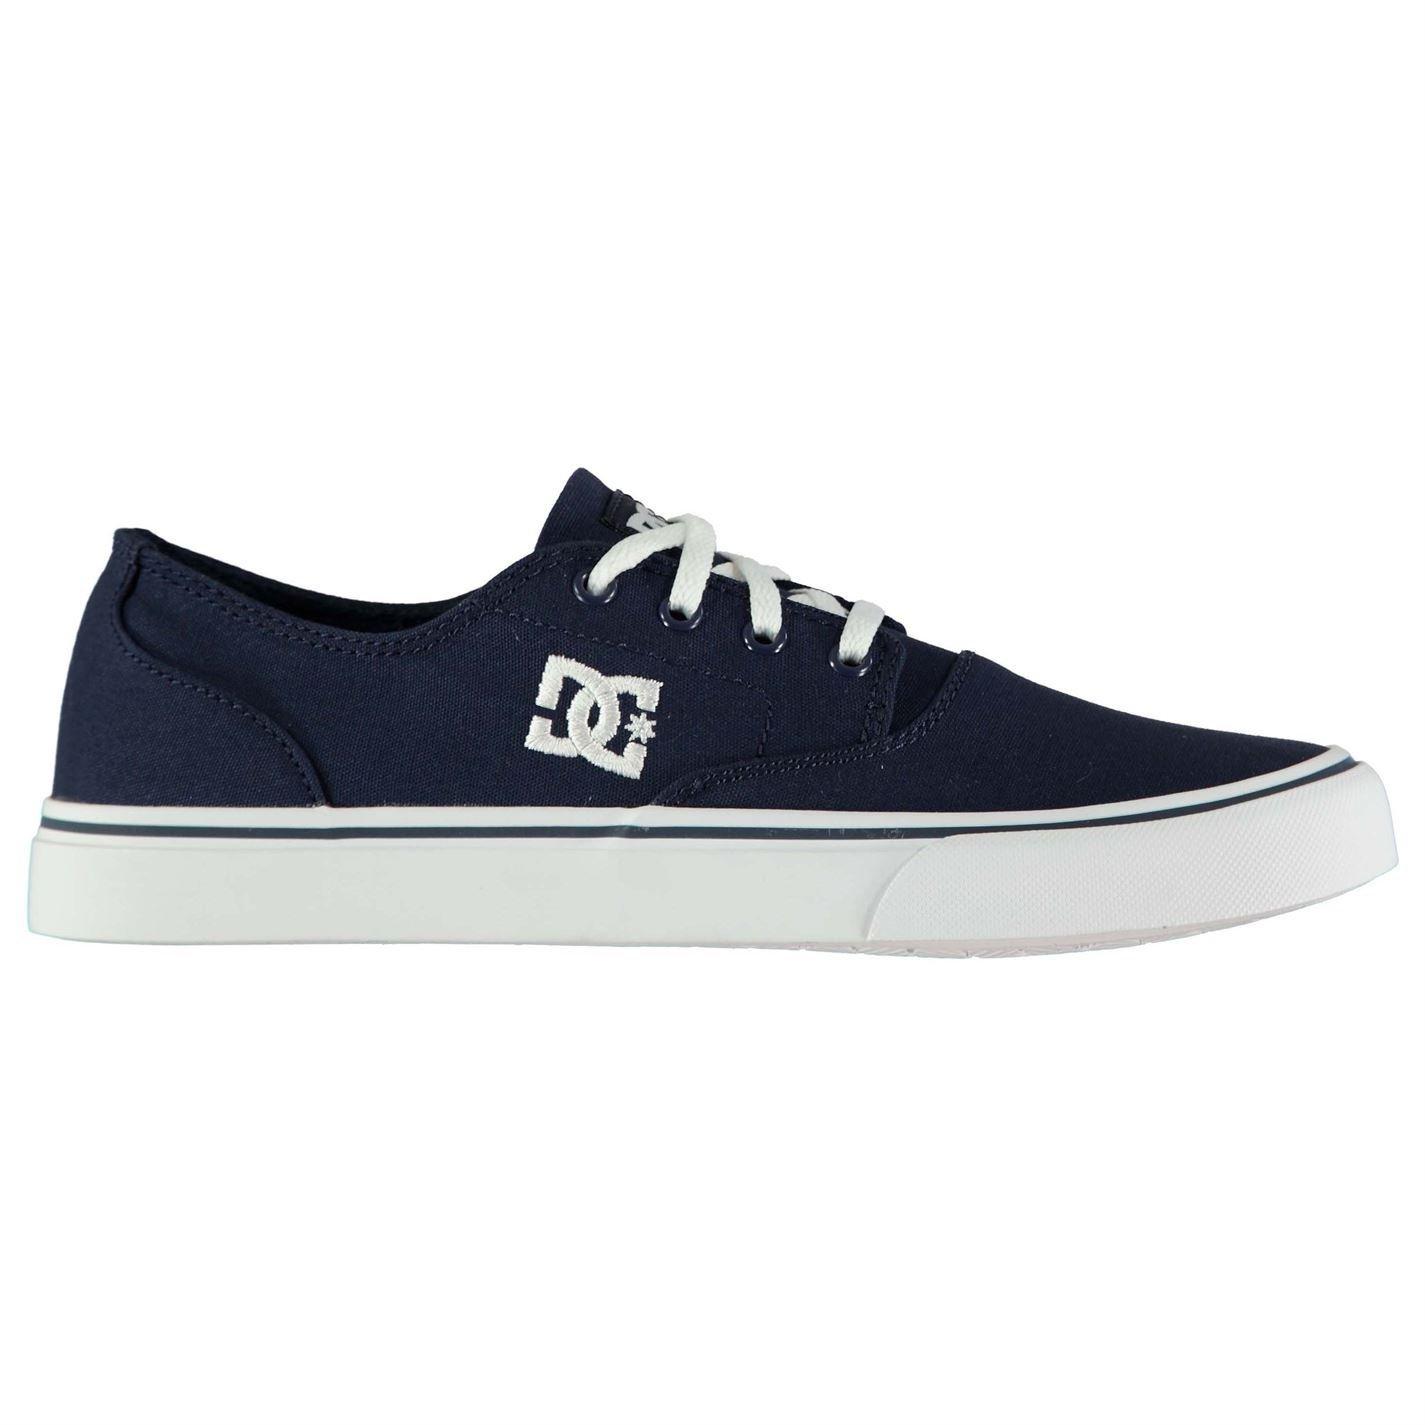 low priced 030e3 5d139 Original scarpe Dc Flash 2 Scarpe da Skate da Uomo Uomo Uomo Blu Navy Skate  Scarpe da Ginnastica - Navy, (UK9) (EU43) (US10) B07CSWGL9H (UK9) (EU43)  (US10) ...